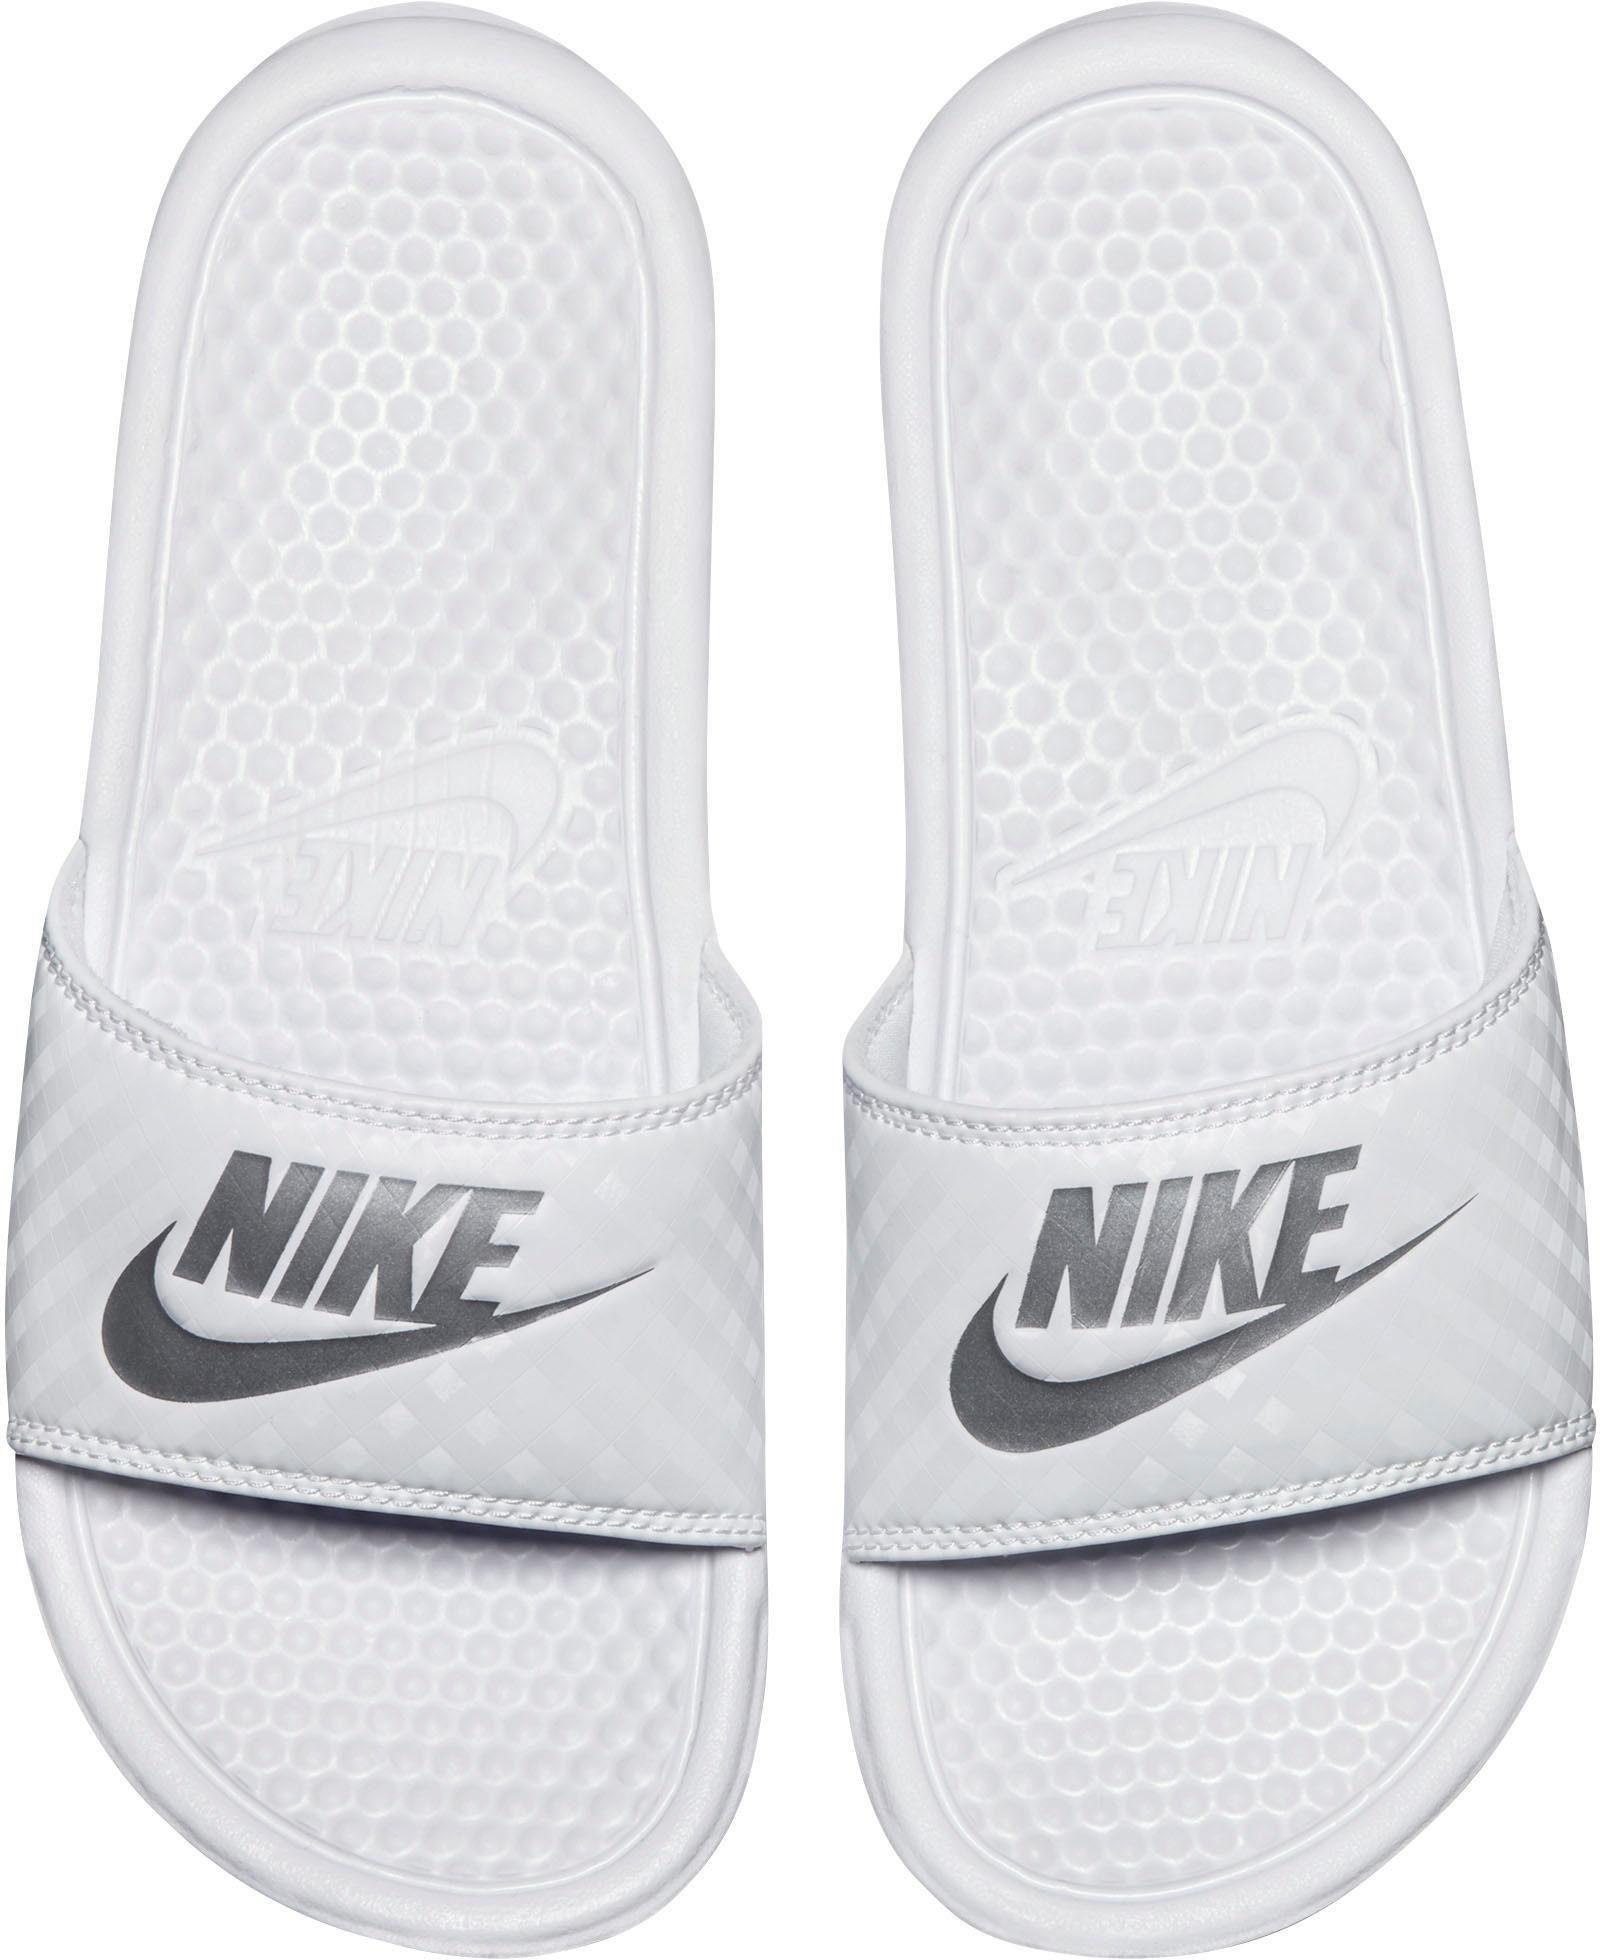 Nike Sportswear Wmns Benassi JDI Badesandale  weiß-silberfarben